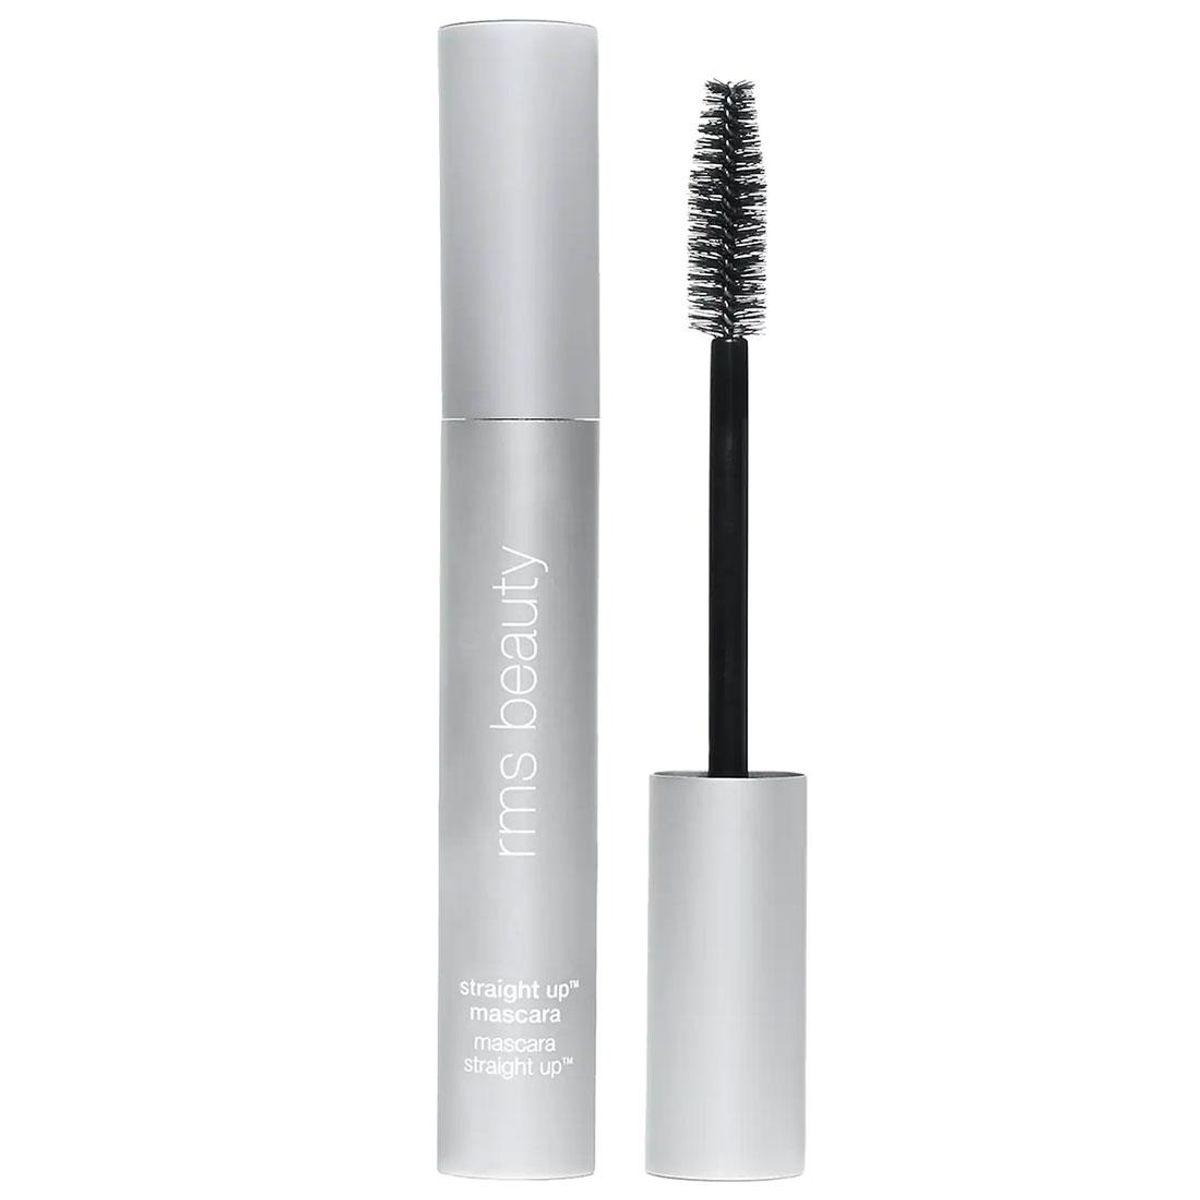 rms beauty straight up volumizing peptide mascara